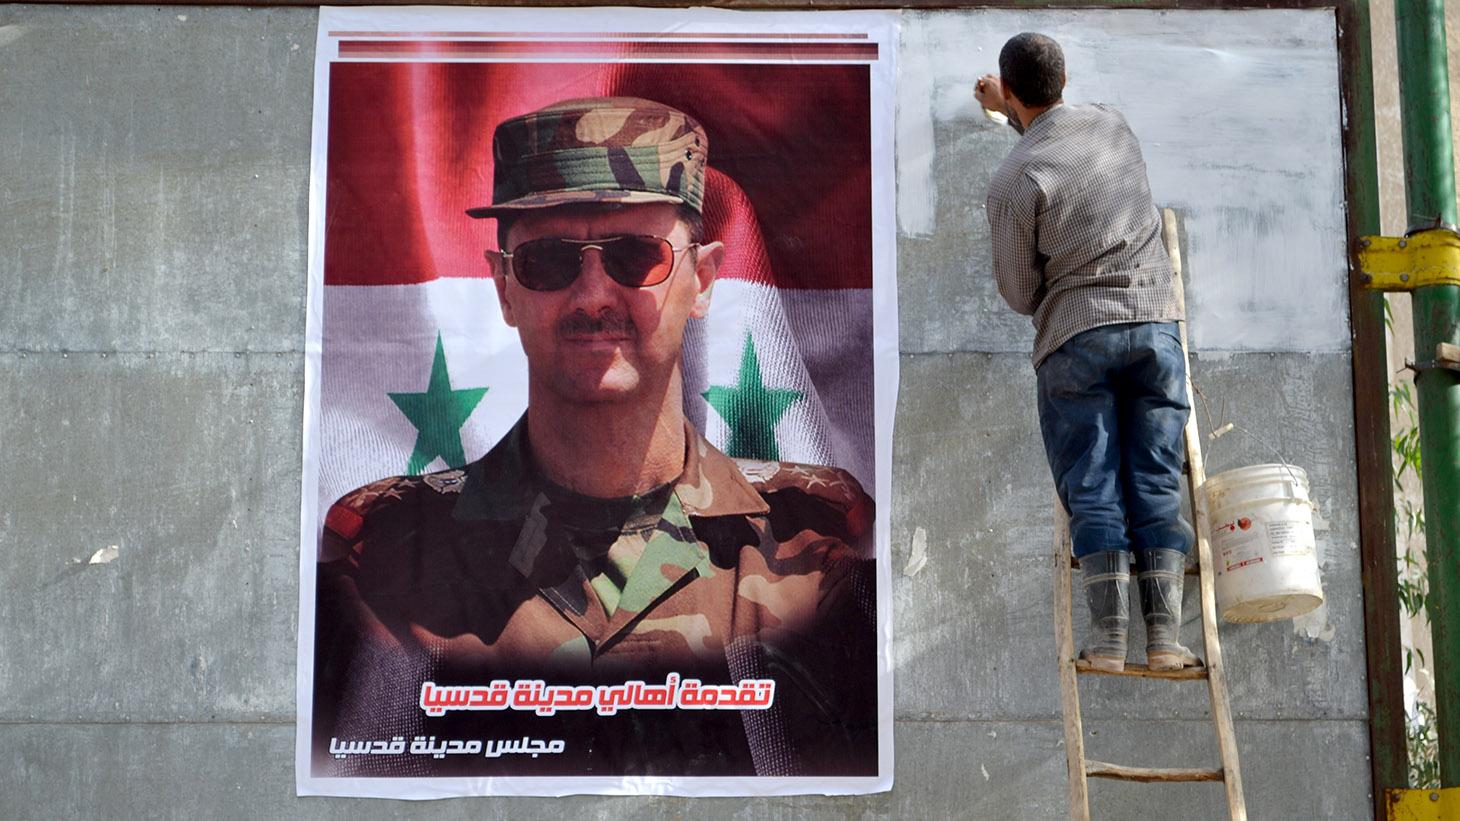 Aleppo Assad Poster